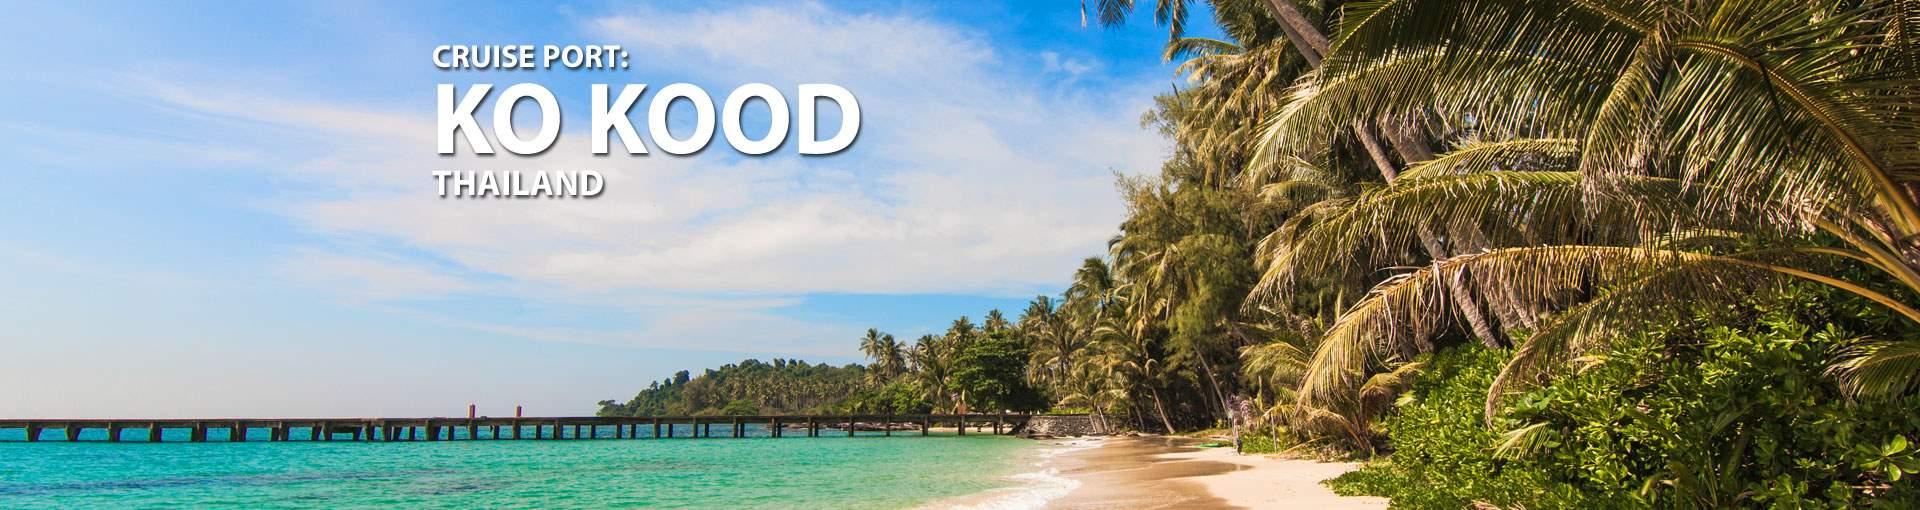 Cruises to Ko Kood, Thailand